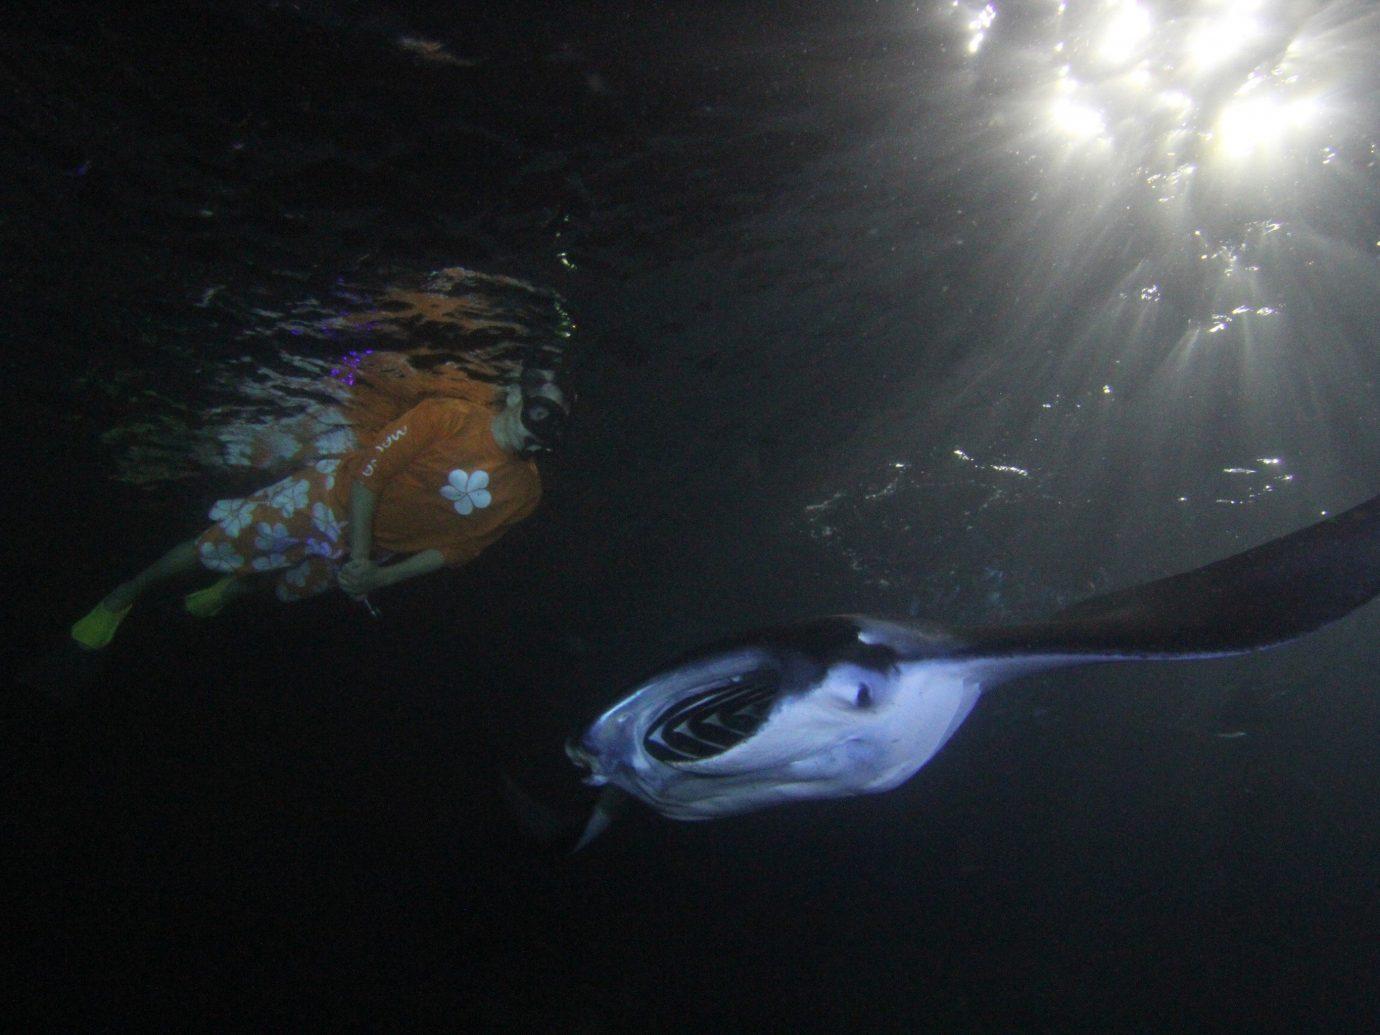 Scuba Diving + Snorkeling Trip Ideas marine biology underwater biology fish deep sea fish reef dark